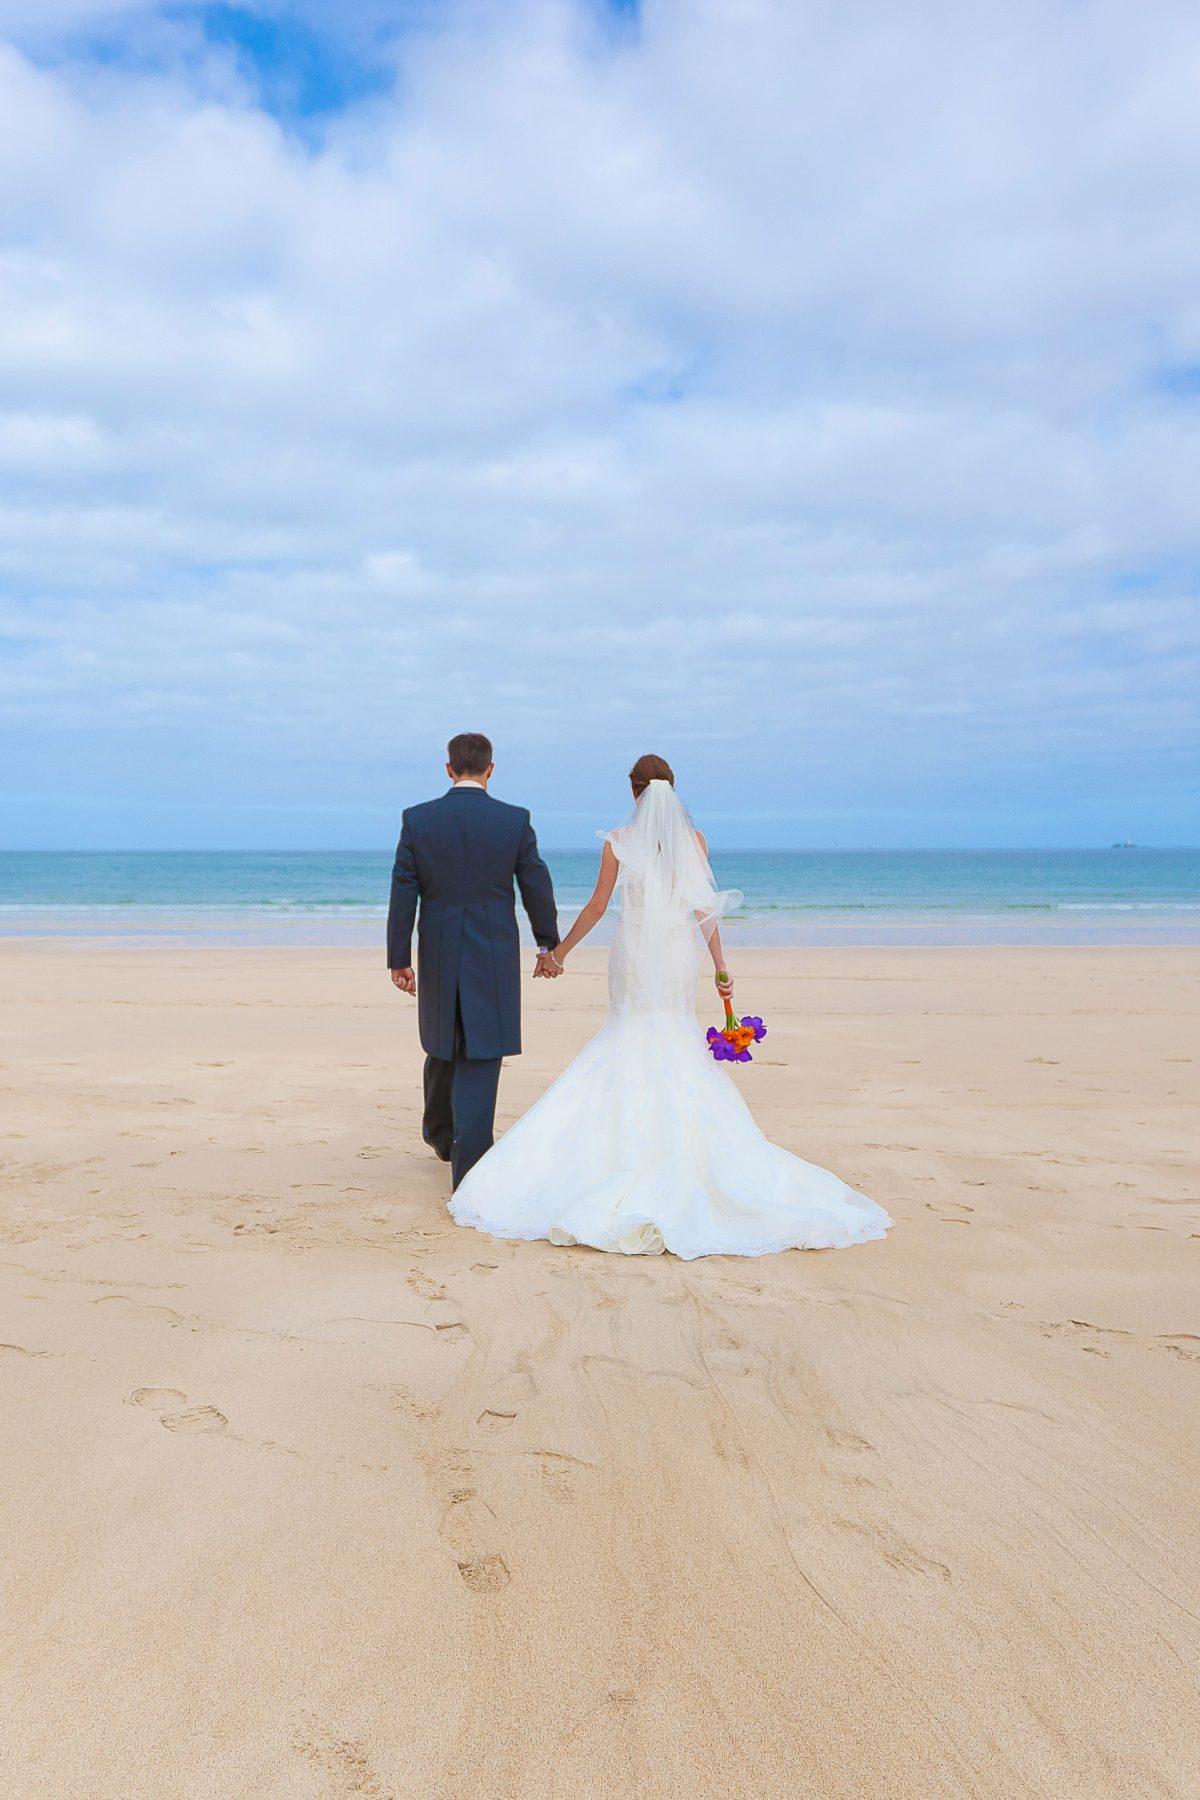 Beach wedding at Carbis Bay